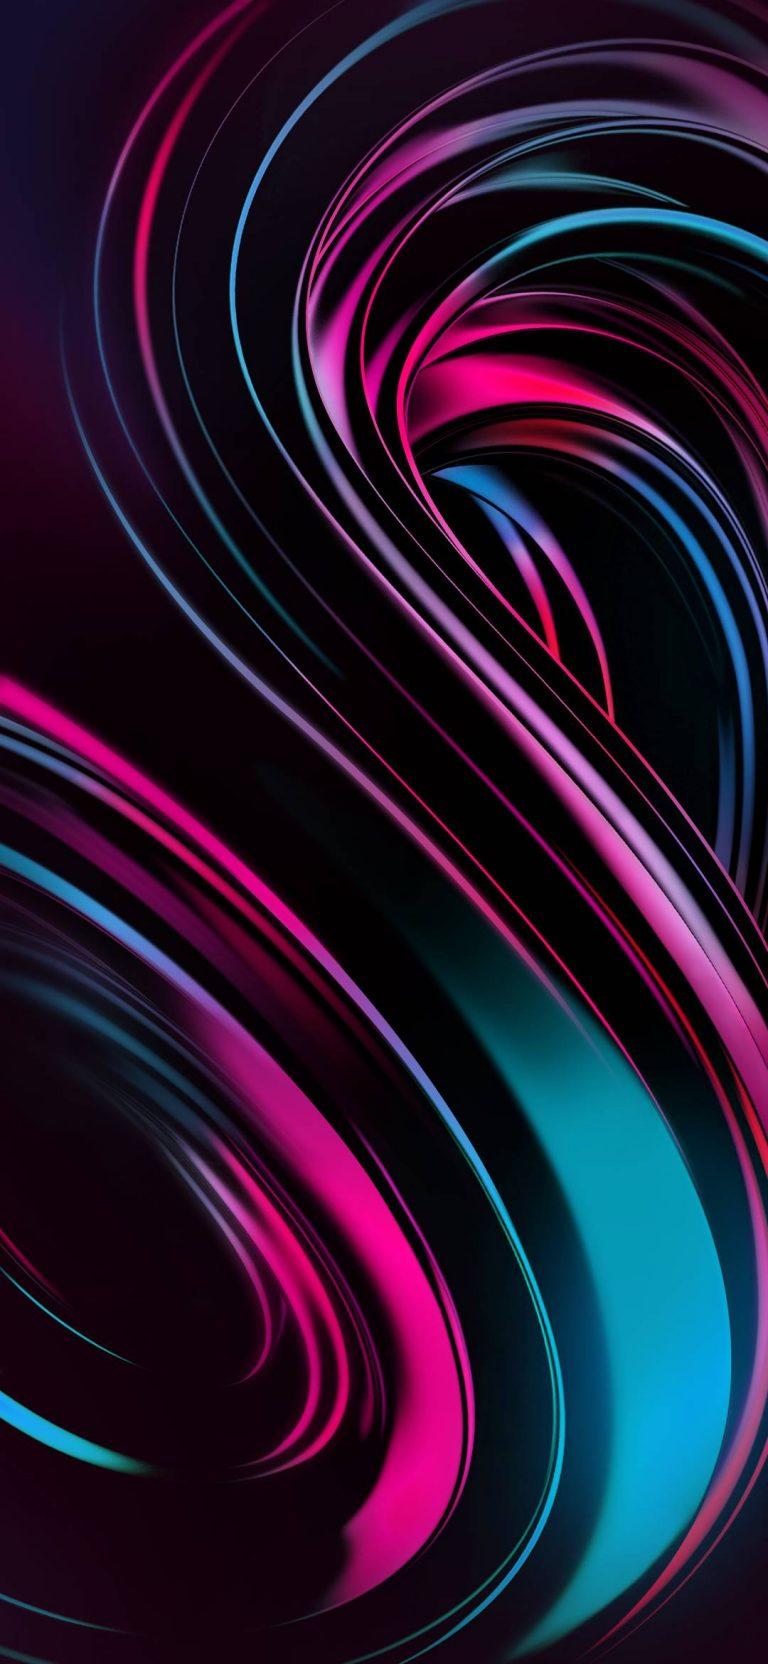 Vivo NEX Dual Display Edition Stock Wallpaper 08 1080x2340 768x1664